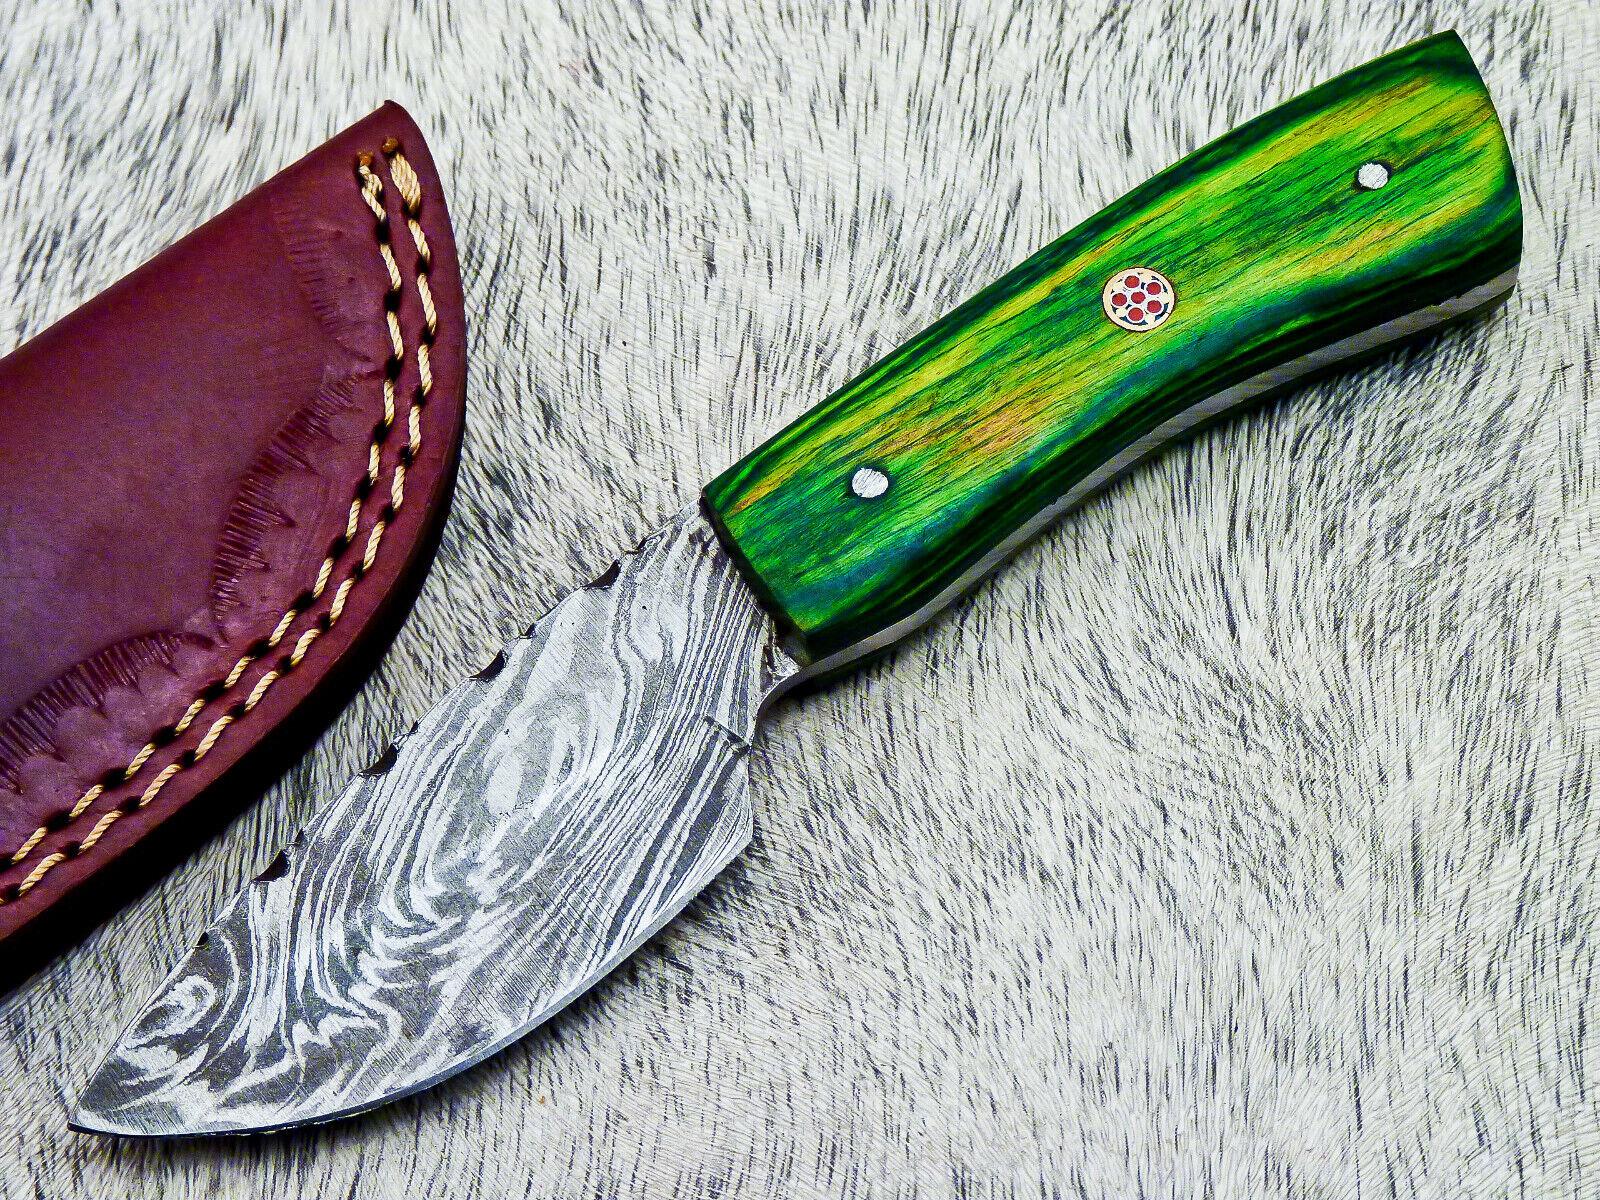 CUSTOM HAND FORGED DAMASCUS STEEL 6 SKINNER CAMPING KNIFE - HARD WOOD - TM-2822 - $0.99